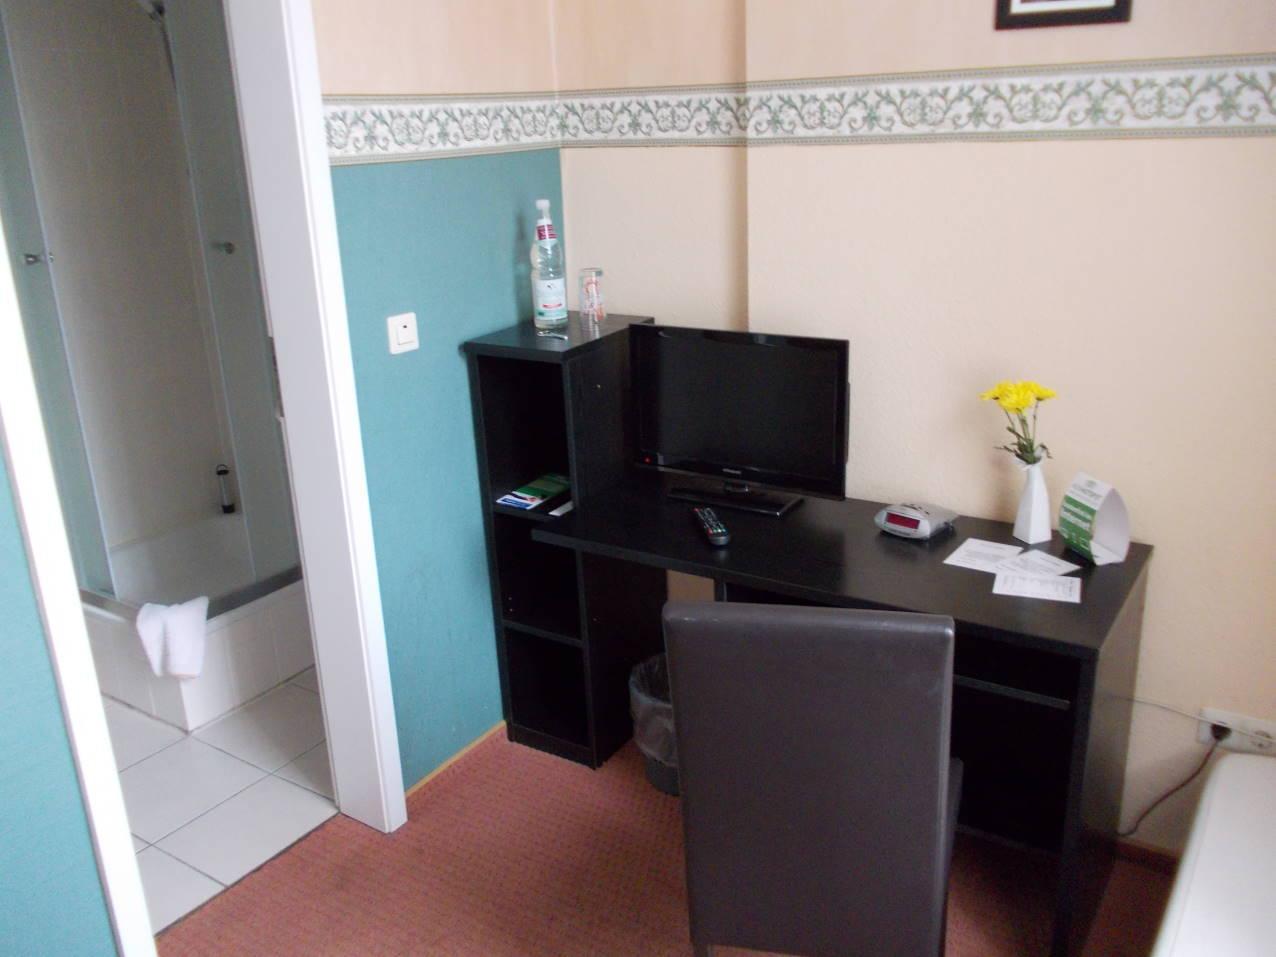 1 bett mit bad. Black Bedroom Furniture Sets. Home Design Ideas